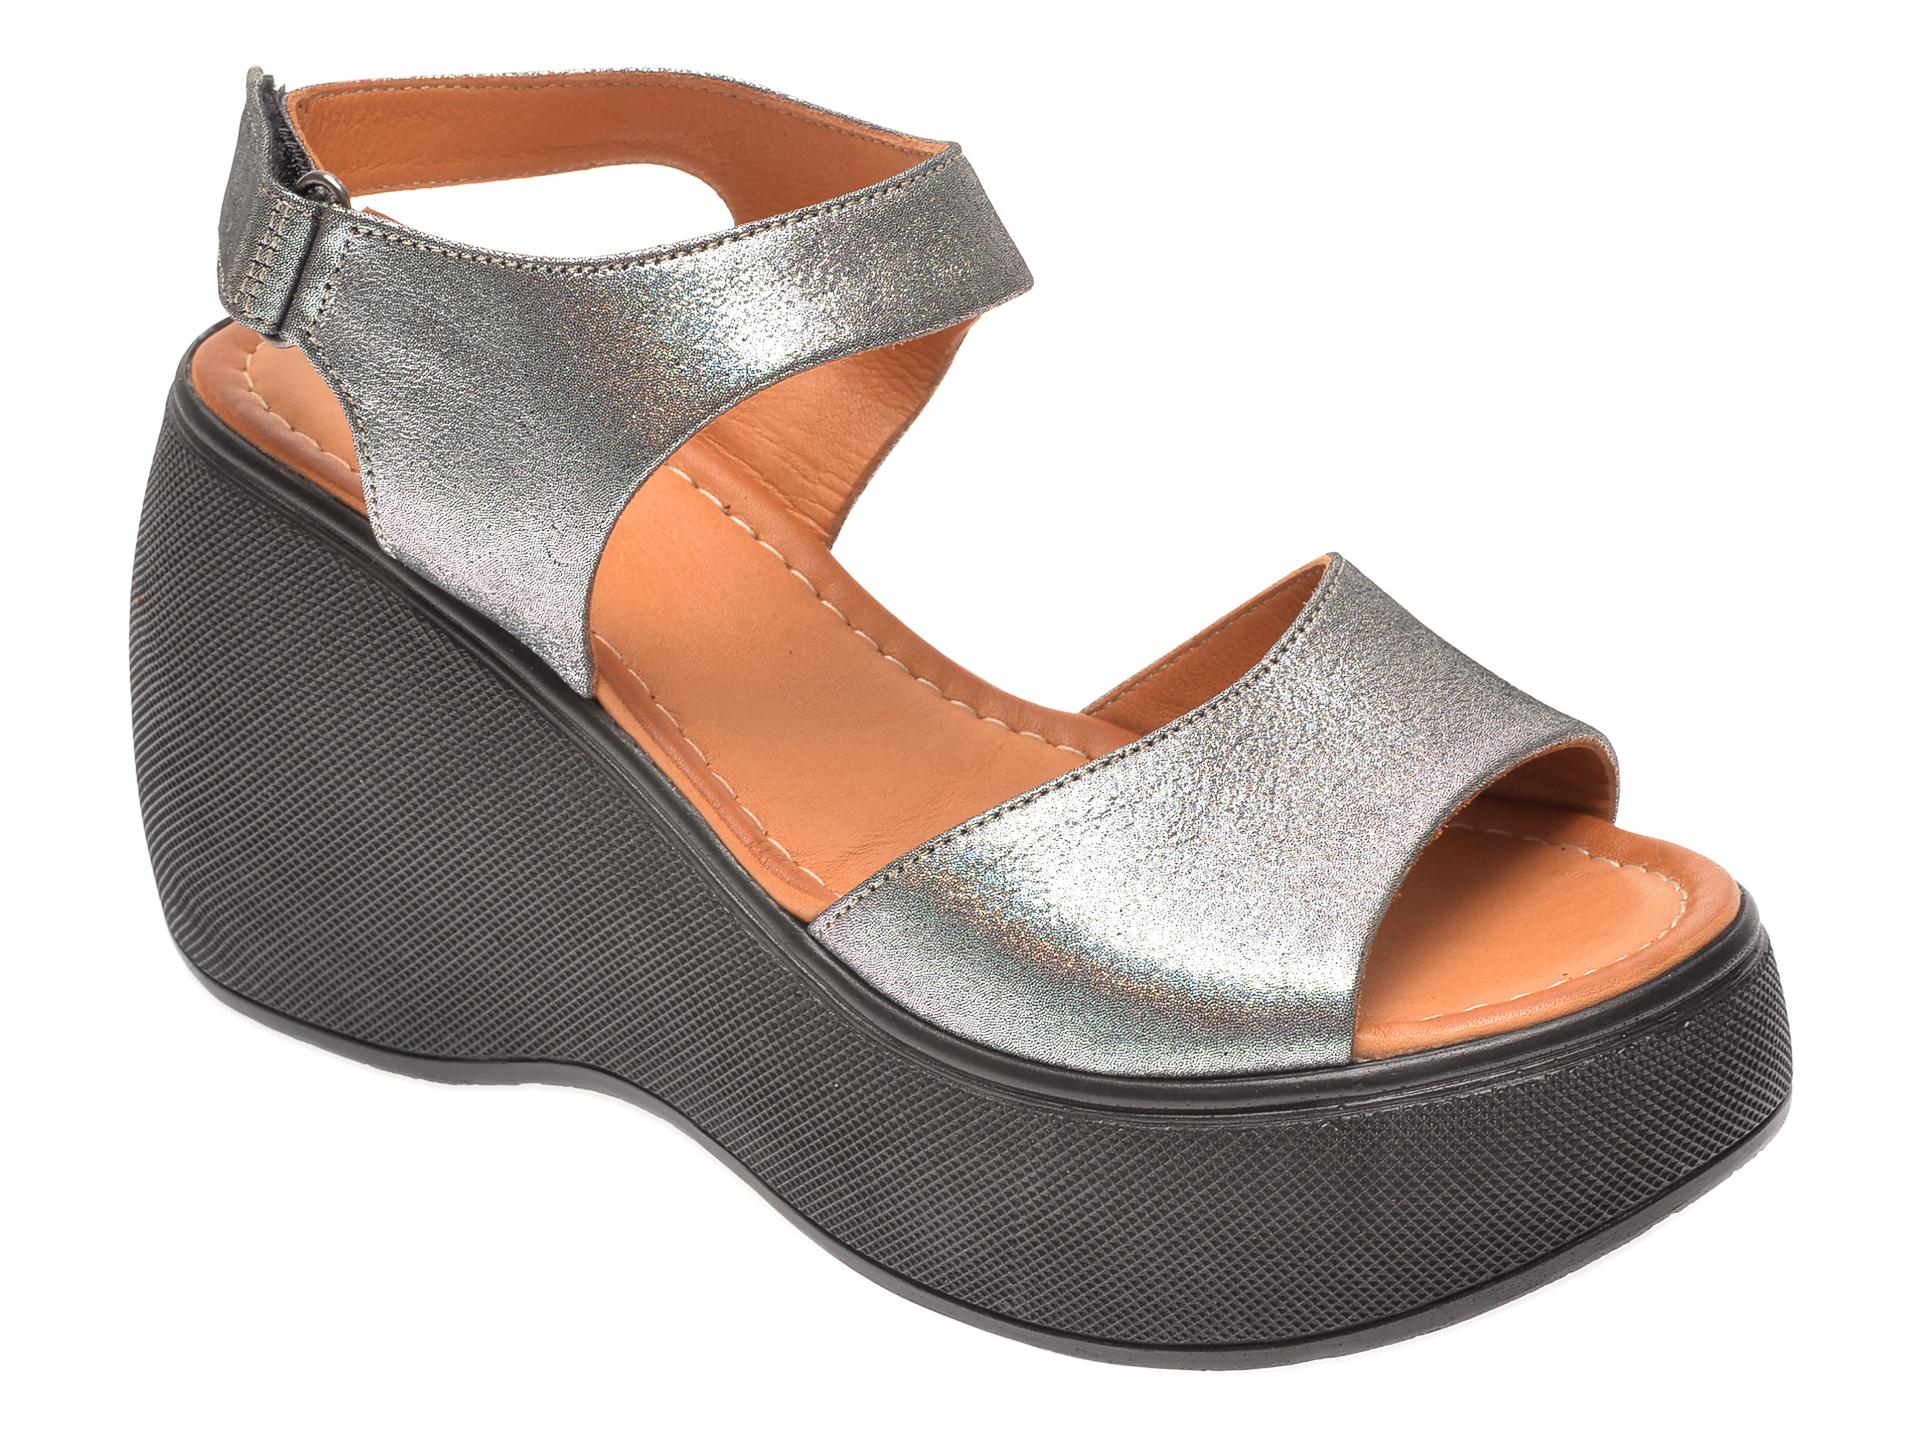 Sandale FLAVIA PASSINI argintii 2482, din piele naturala imagine